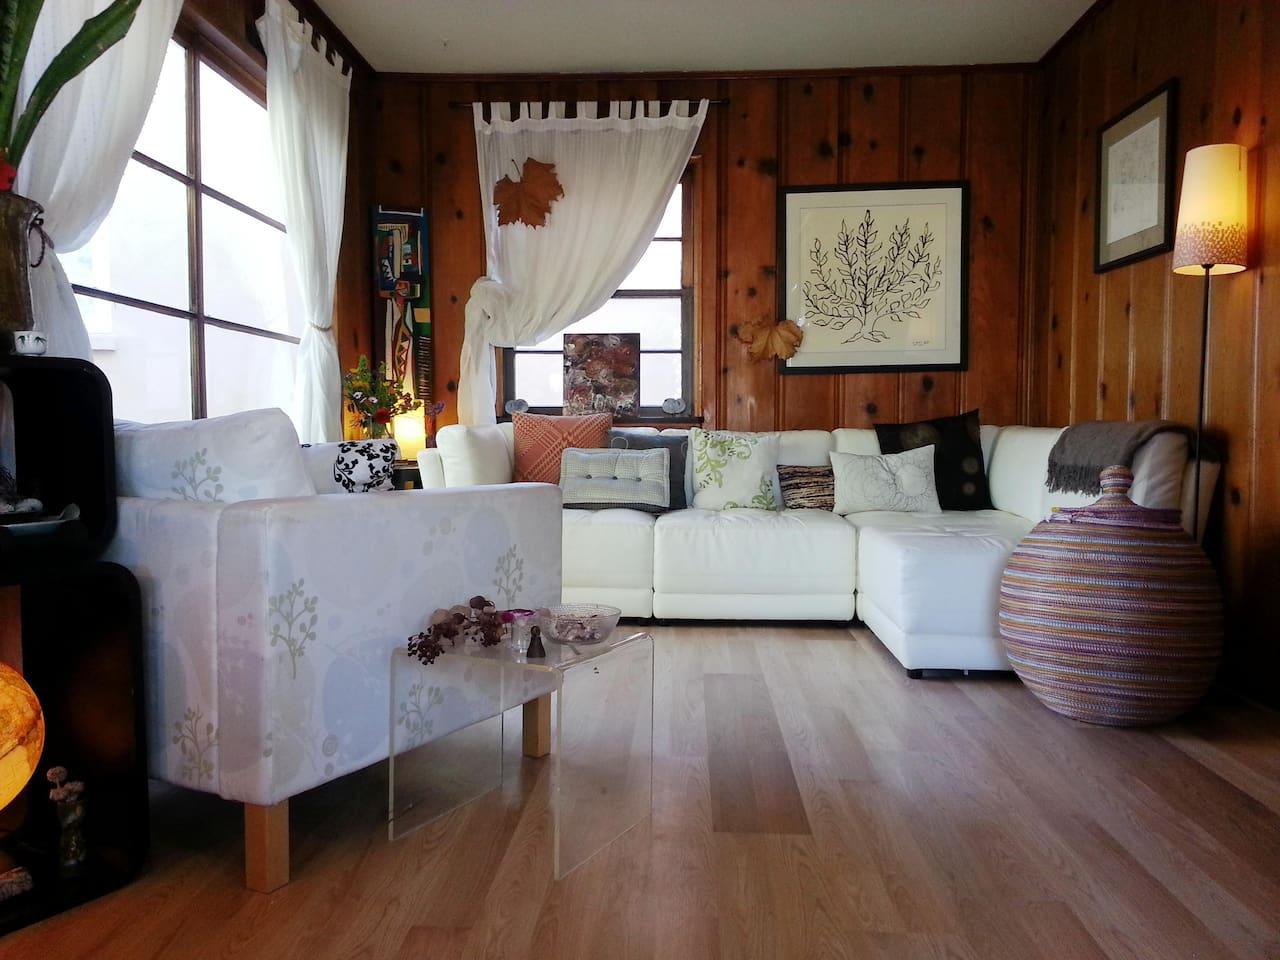 Le living room...